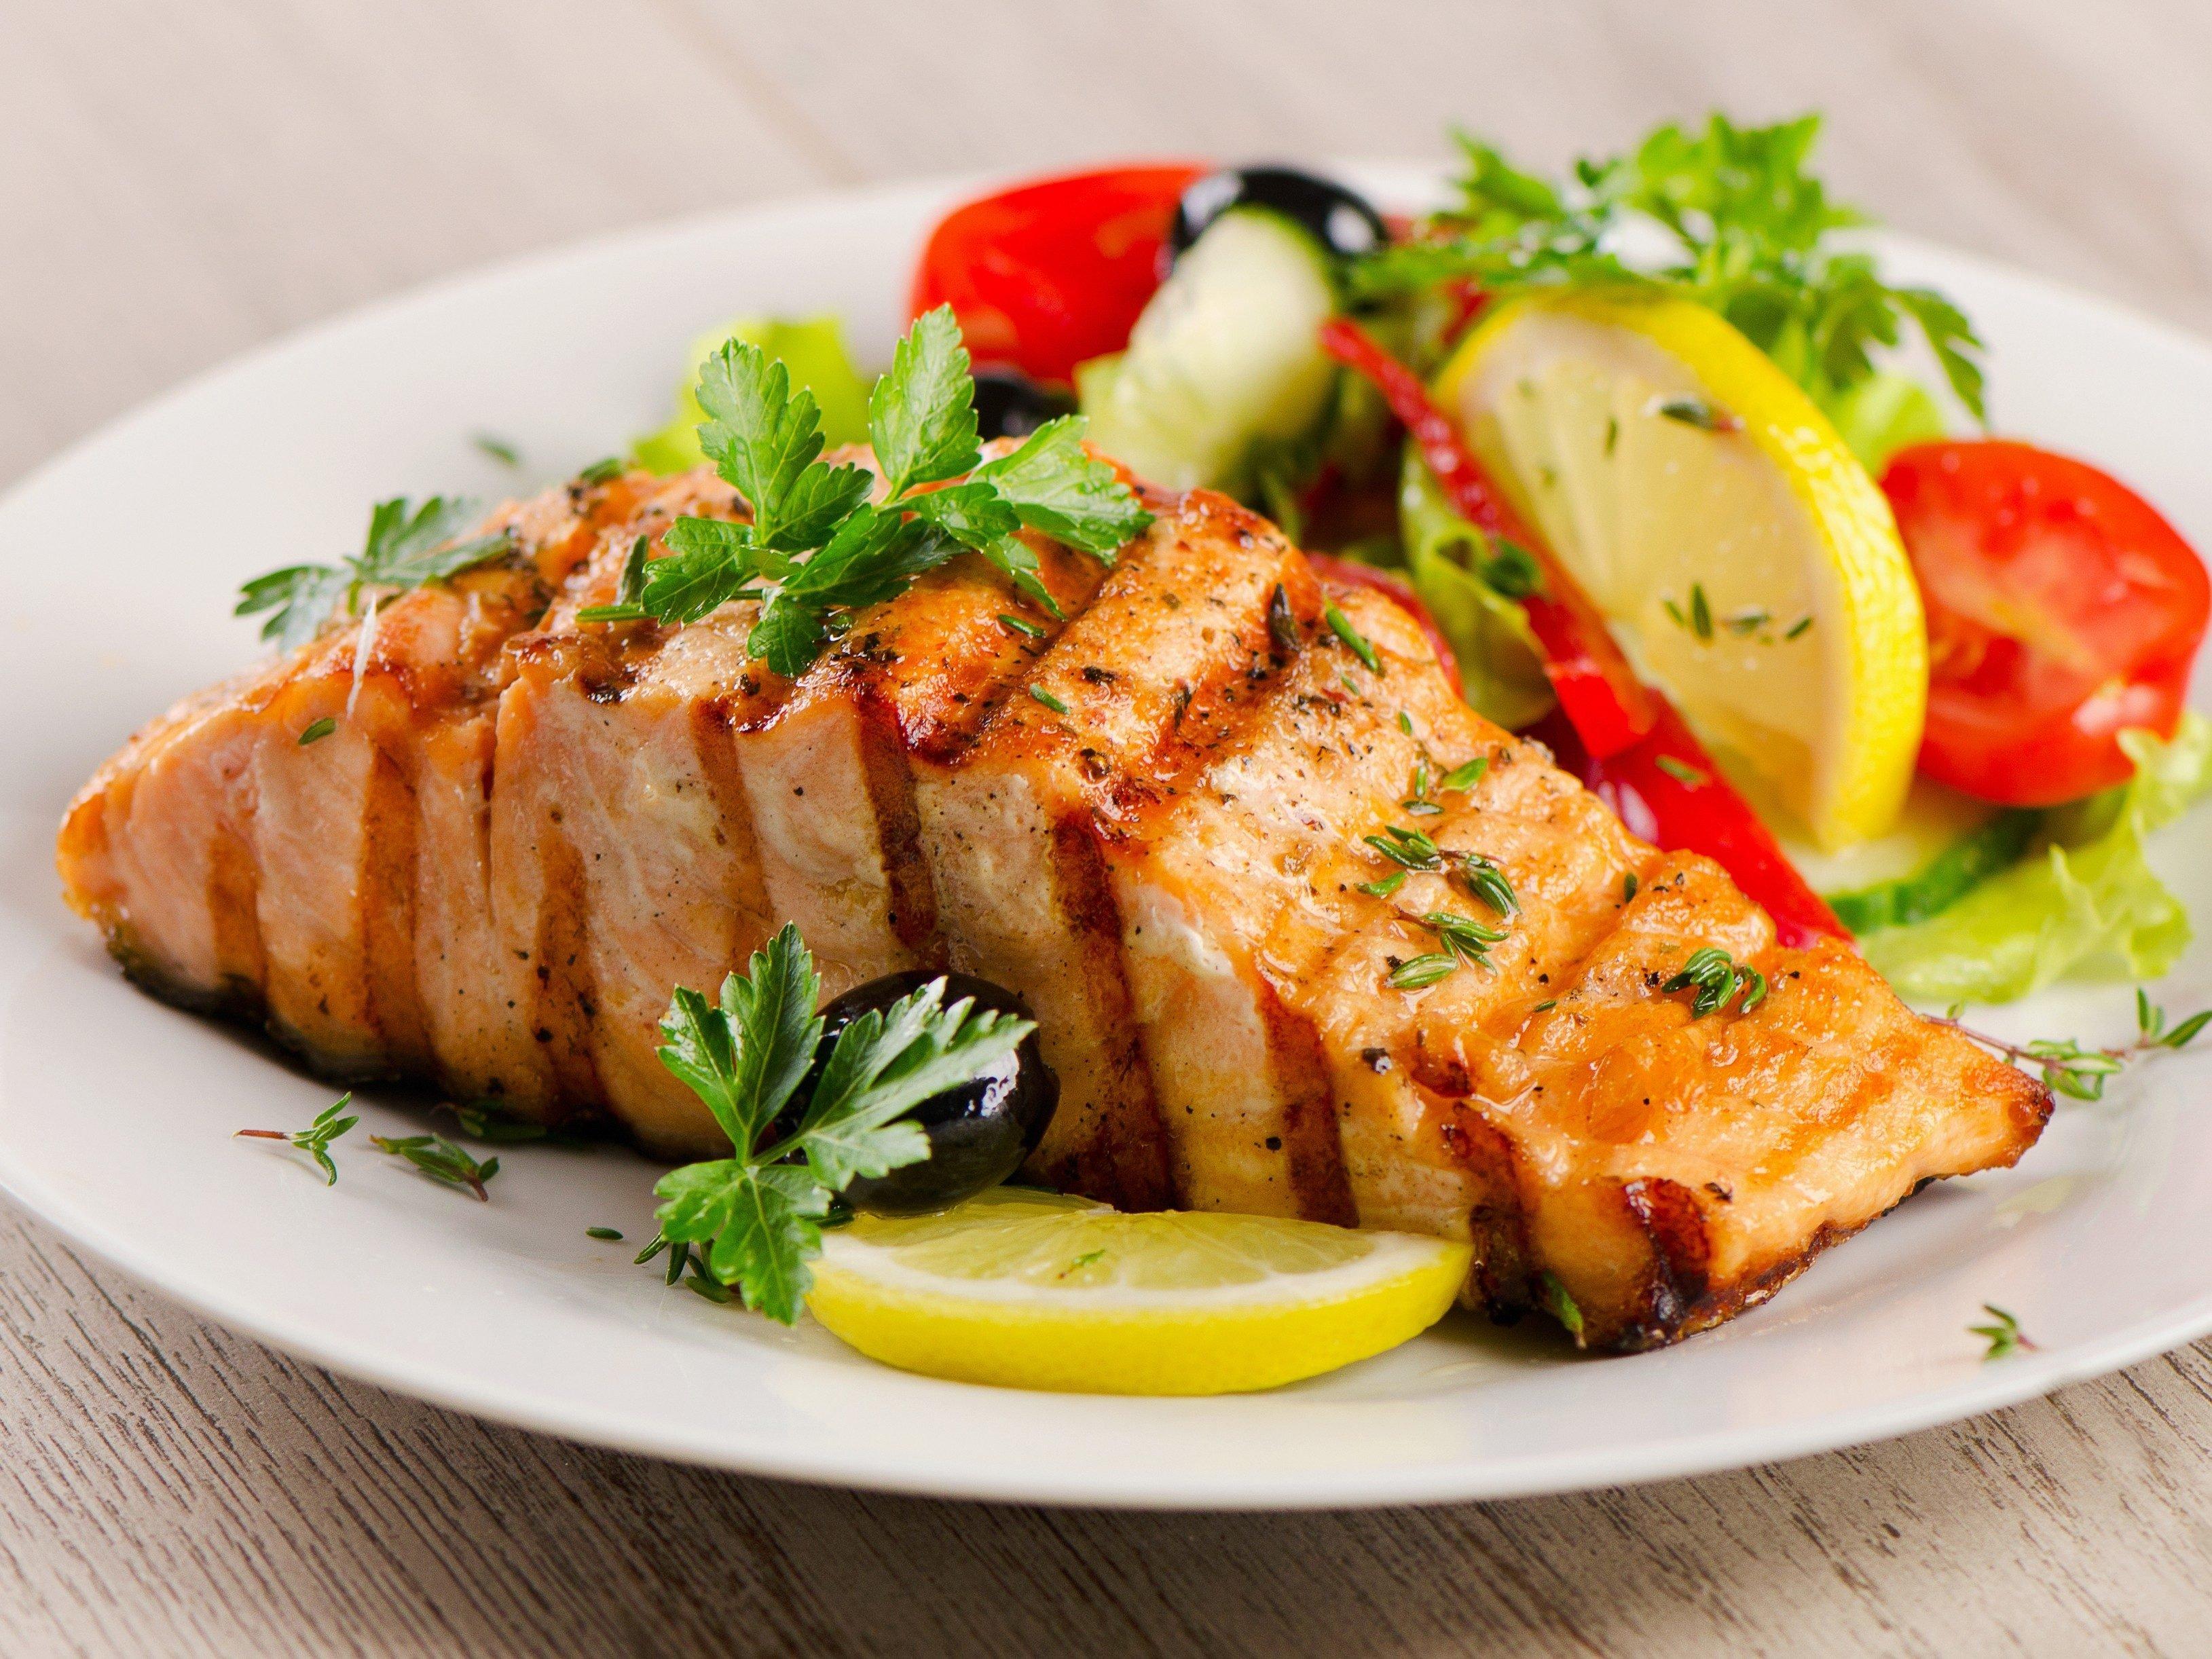 4. Stop eating fish